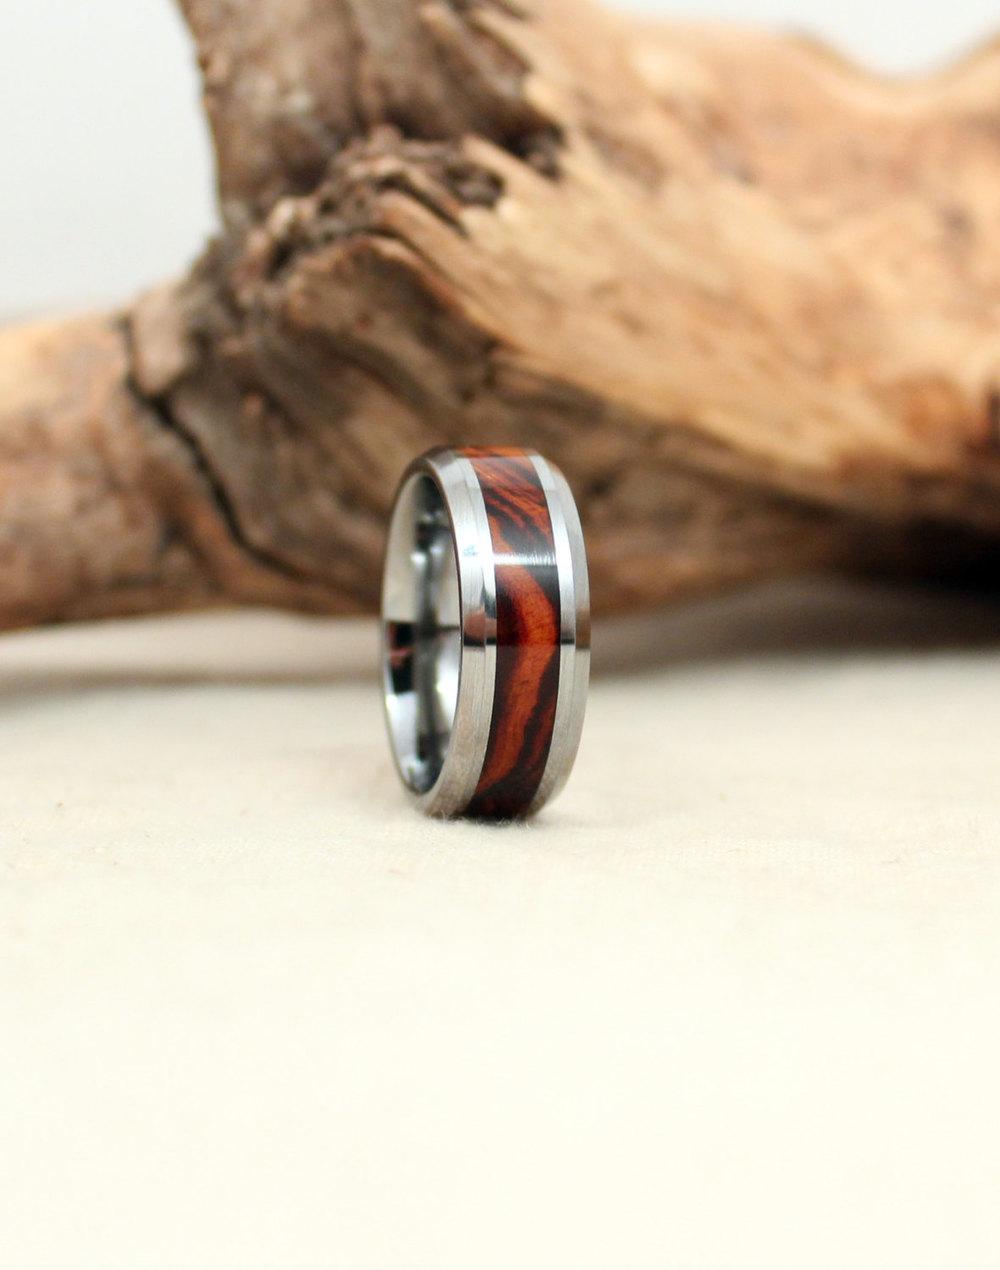 Tungsten Carbide and Arizona Desert Ironwood Burl Wooden Ring